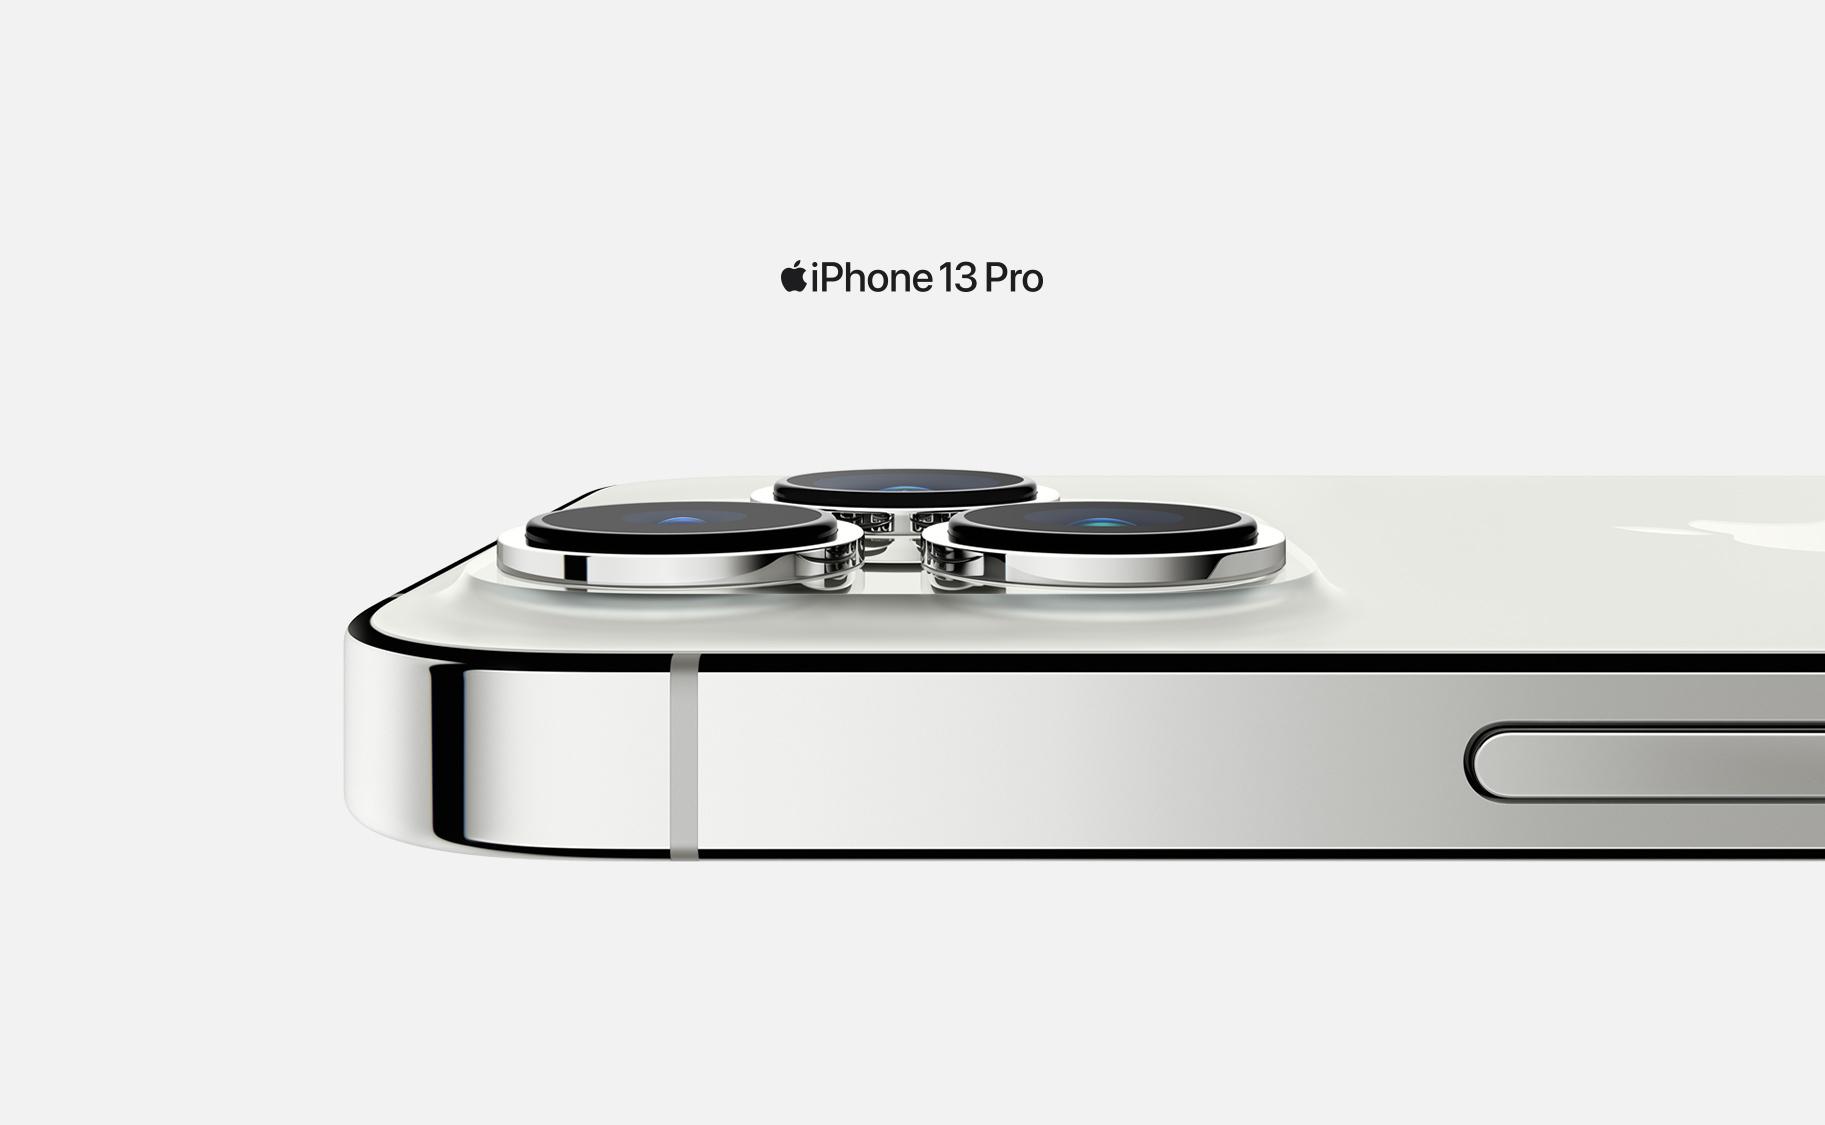 iPhone Pro 13